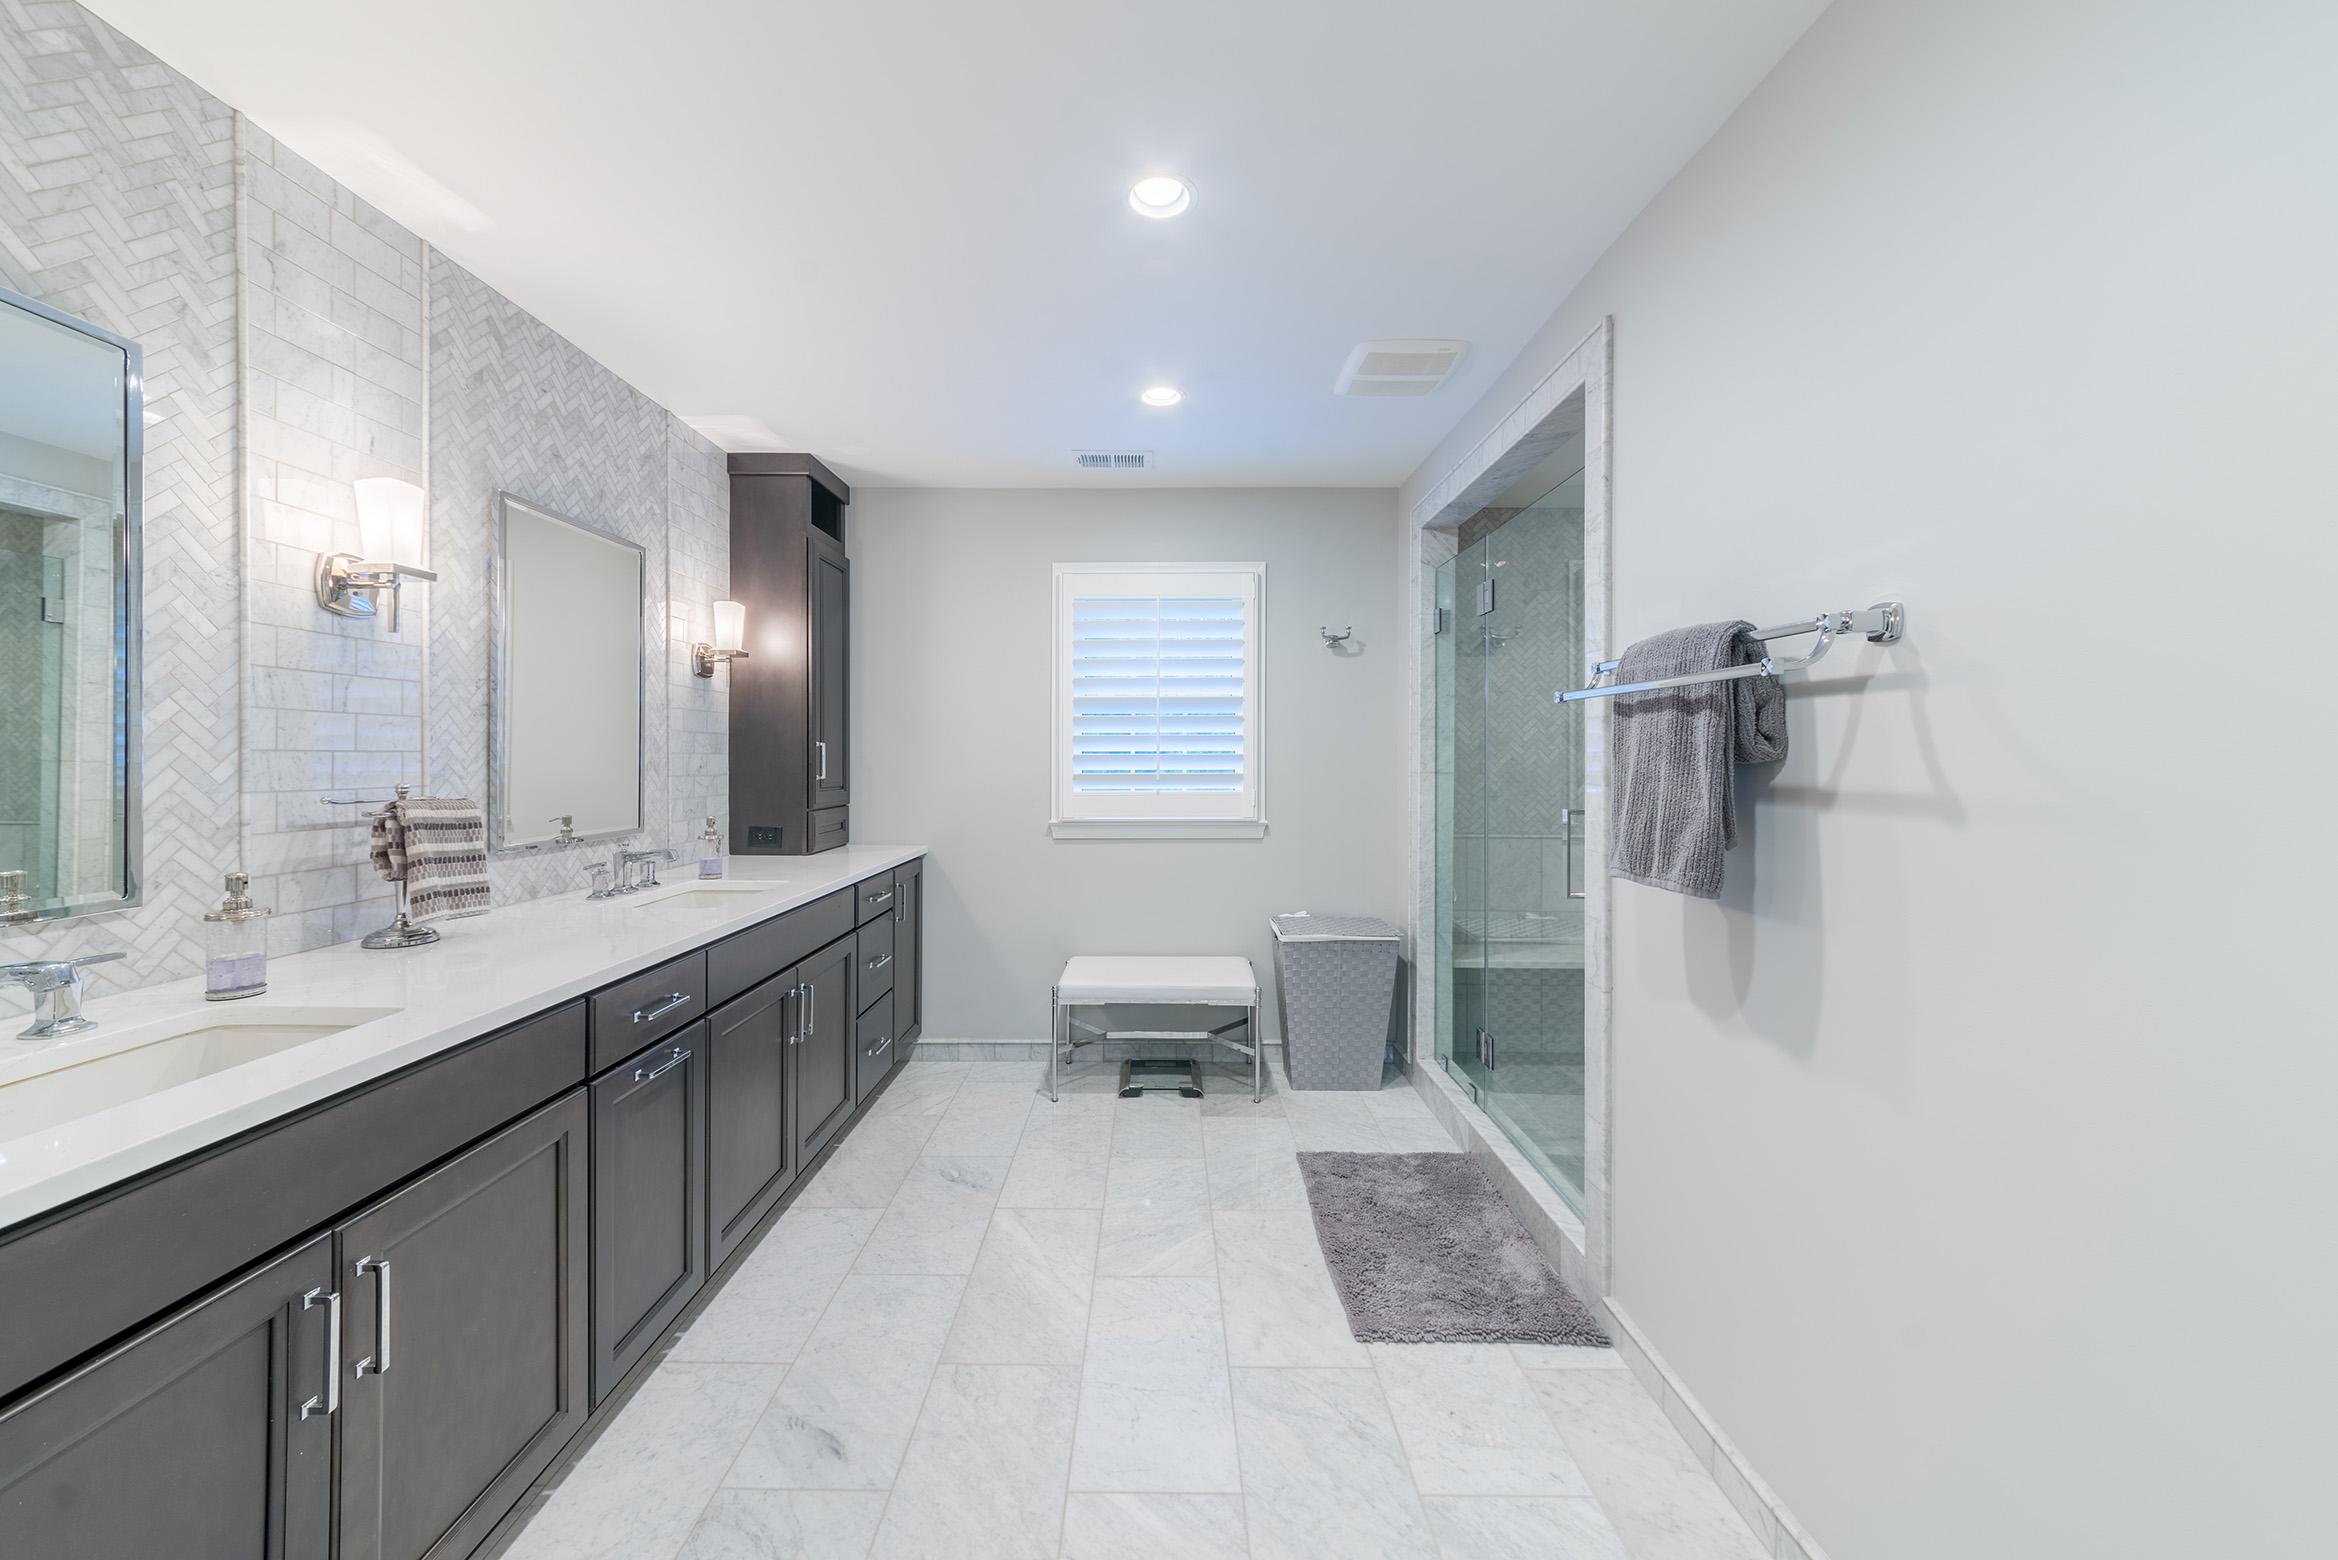 Amazing Bathroom Renovation Northern Virginia Let Us Help You